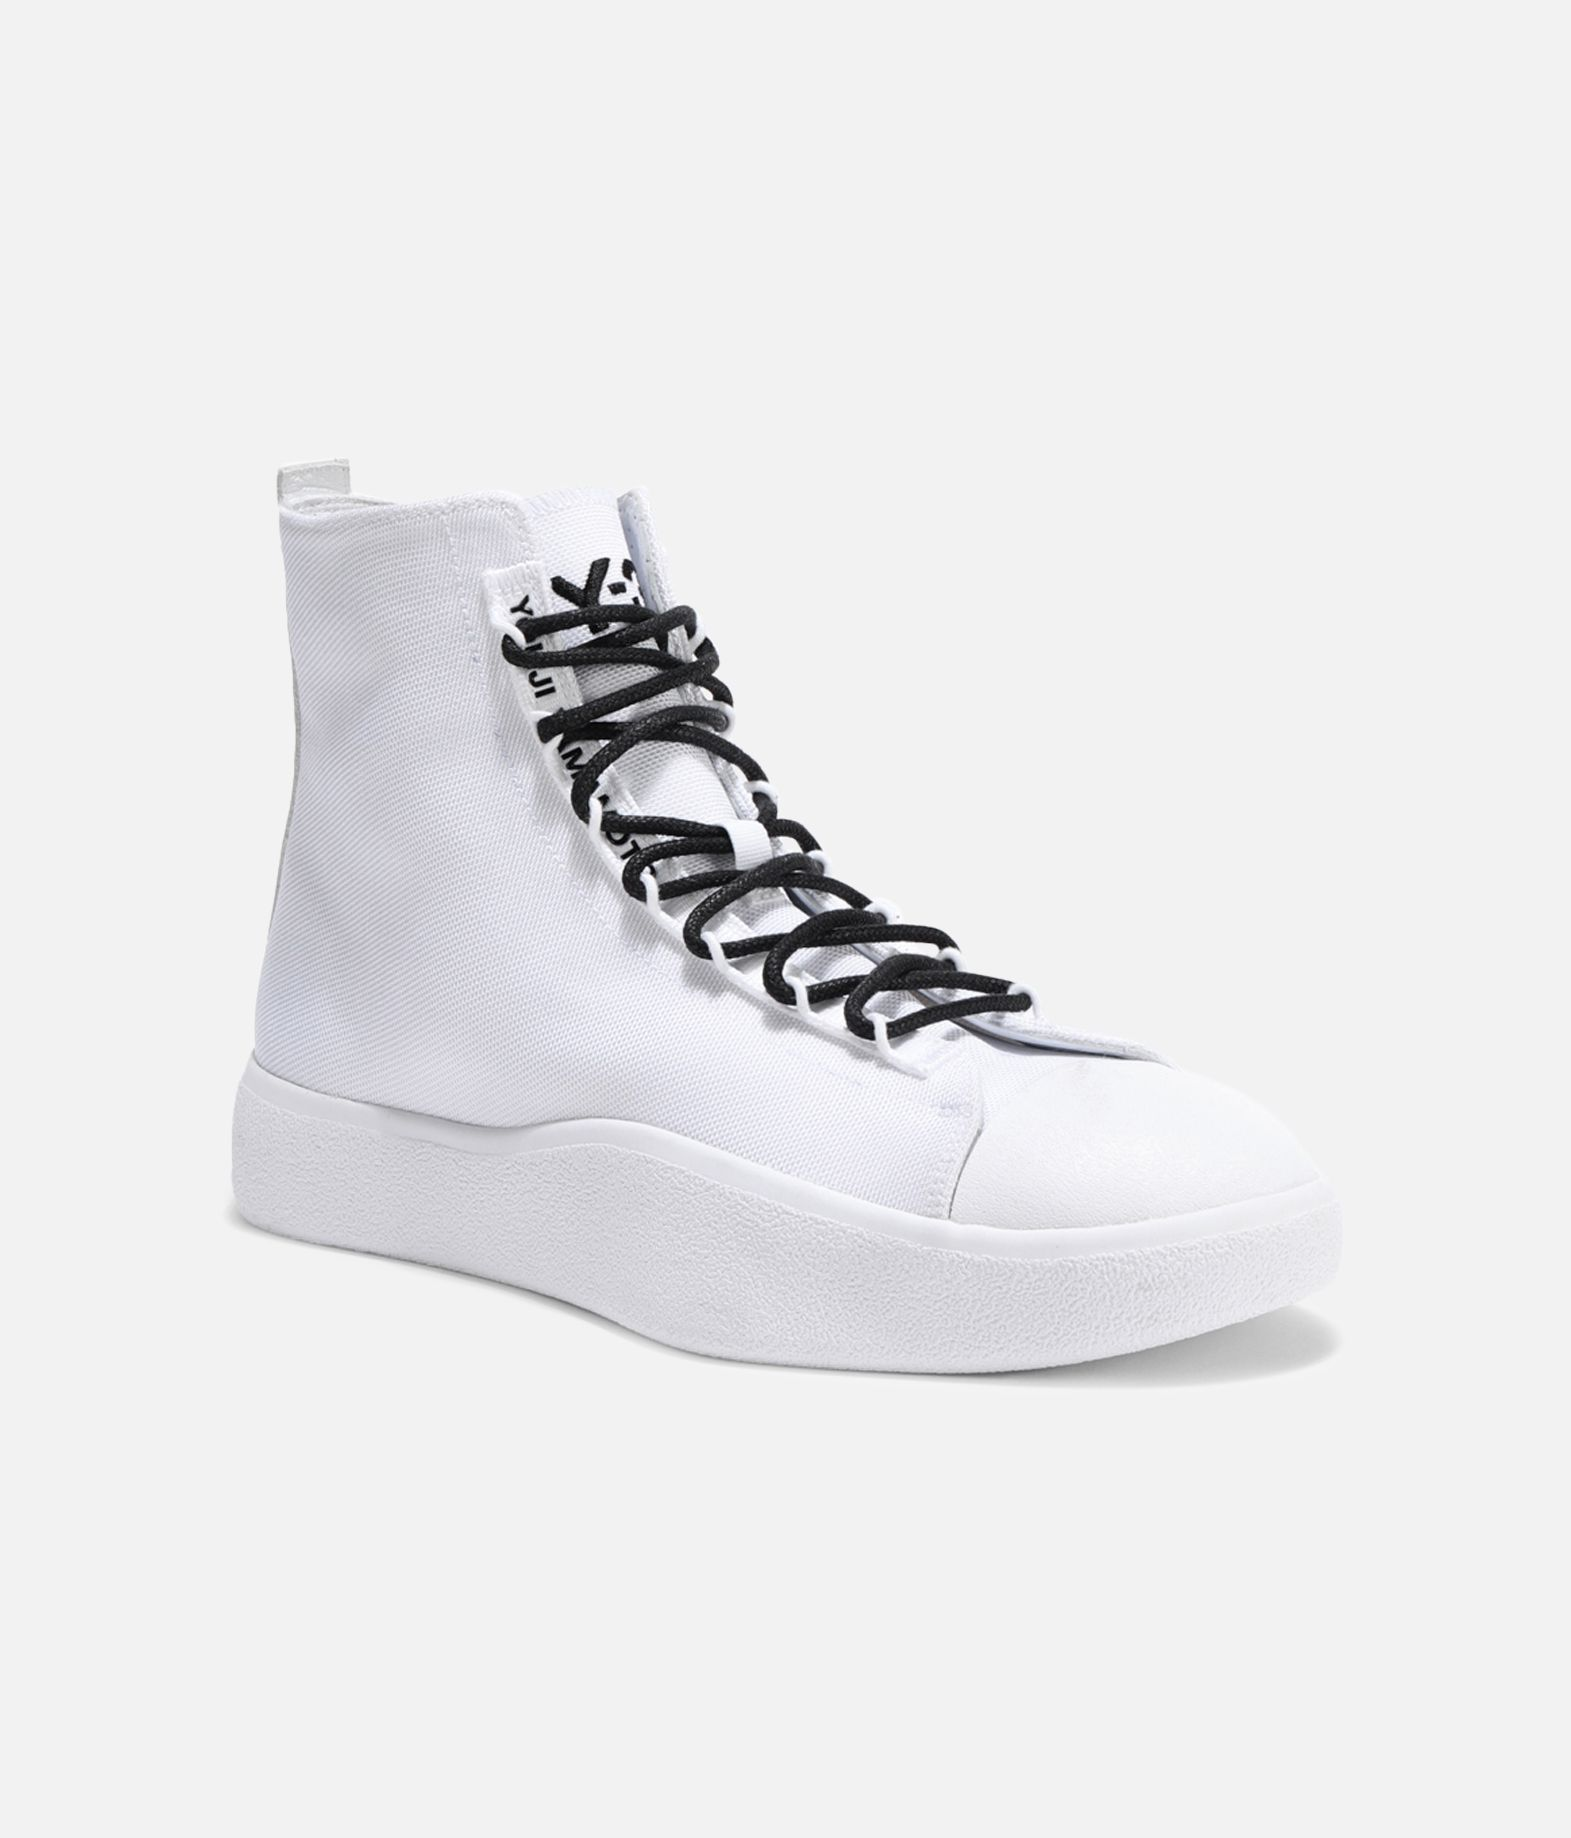 Y-3 Y-3 Bashyo Sneakers alte E e